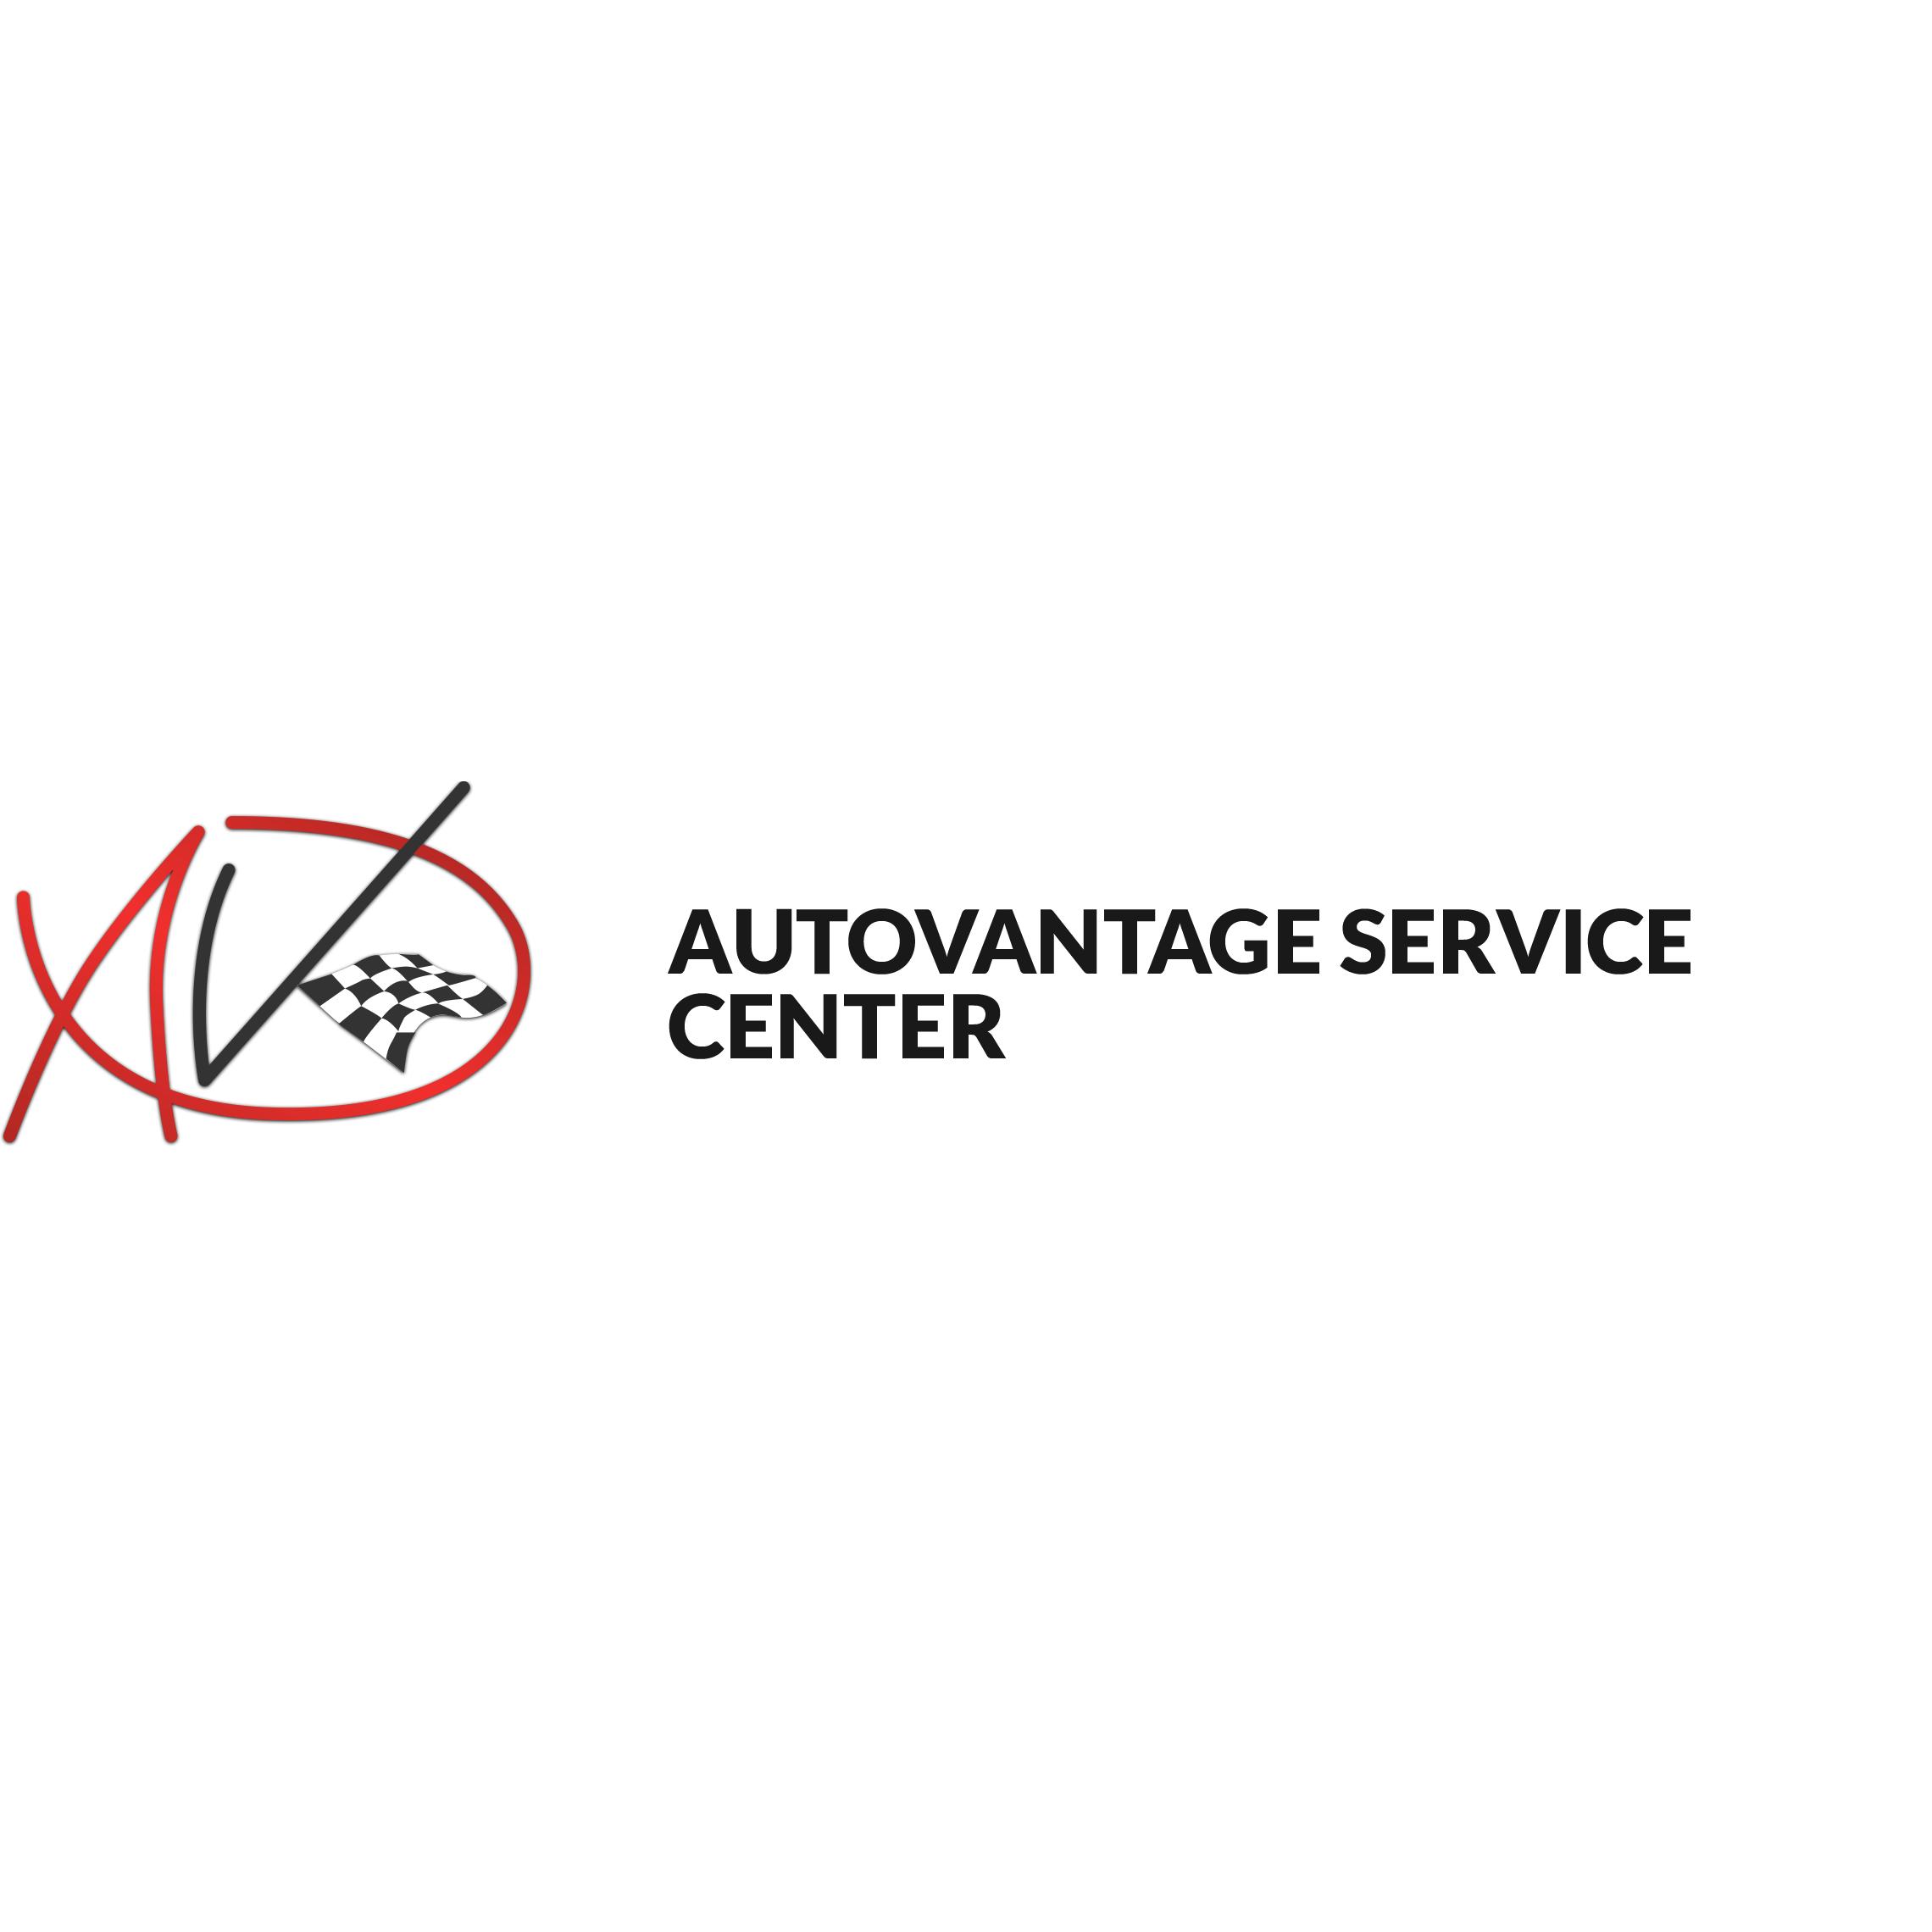 Autovantage Service Center